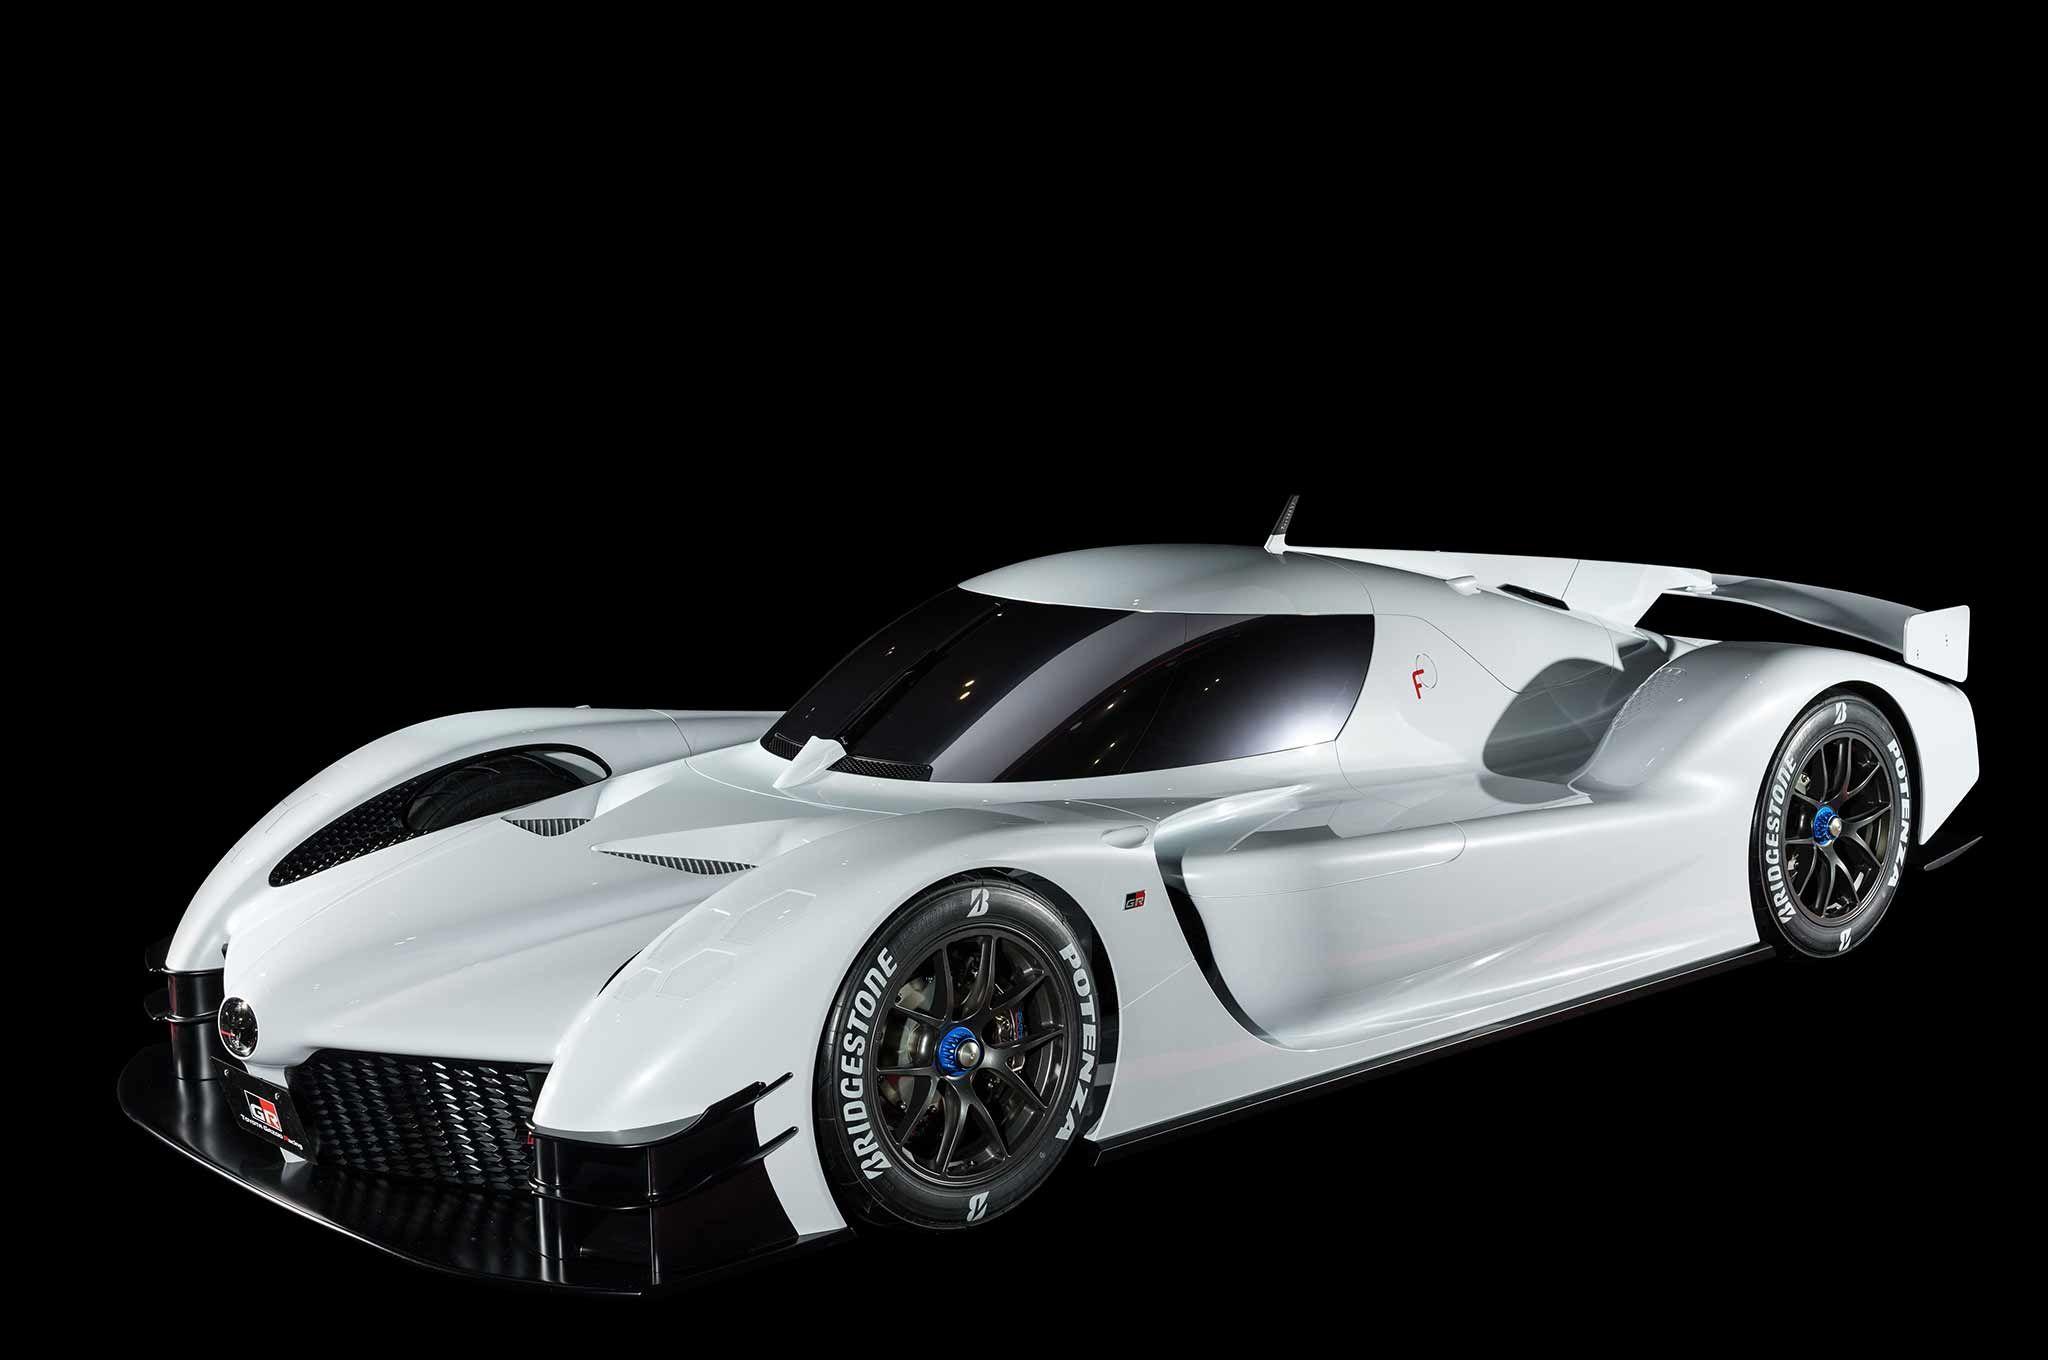 Toyota GR Super Sport Concept Revealed at Tokyo Auto Salon